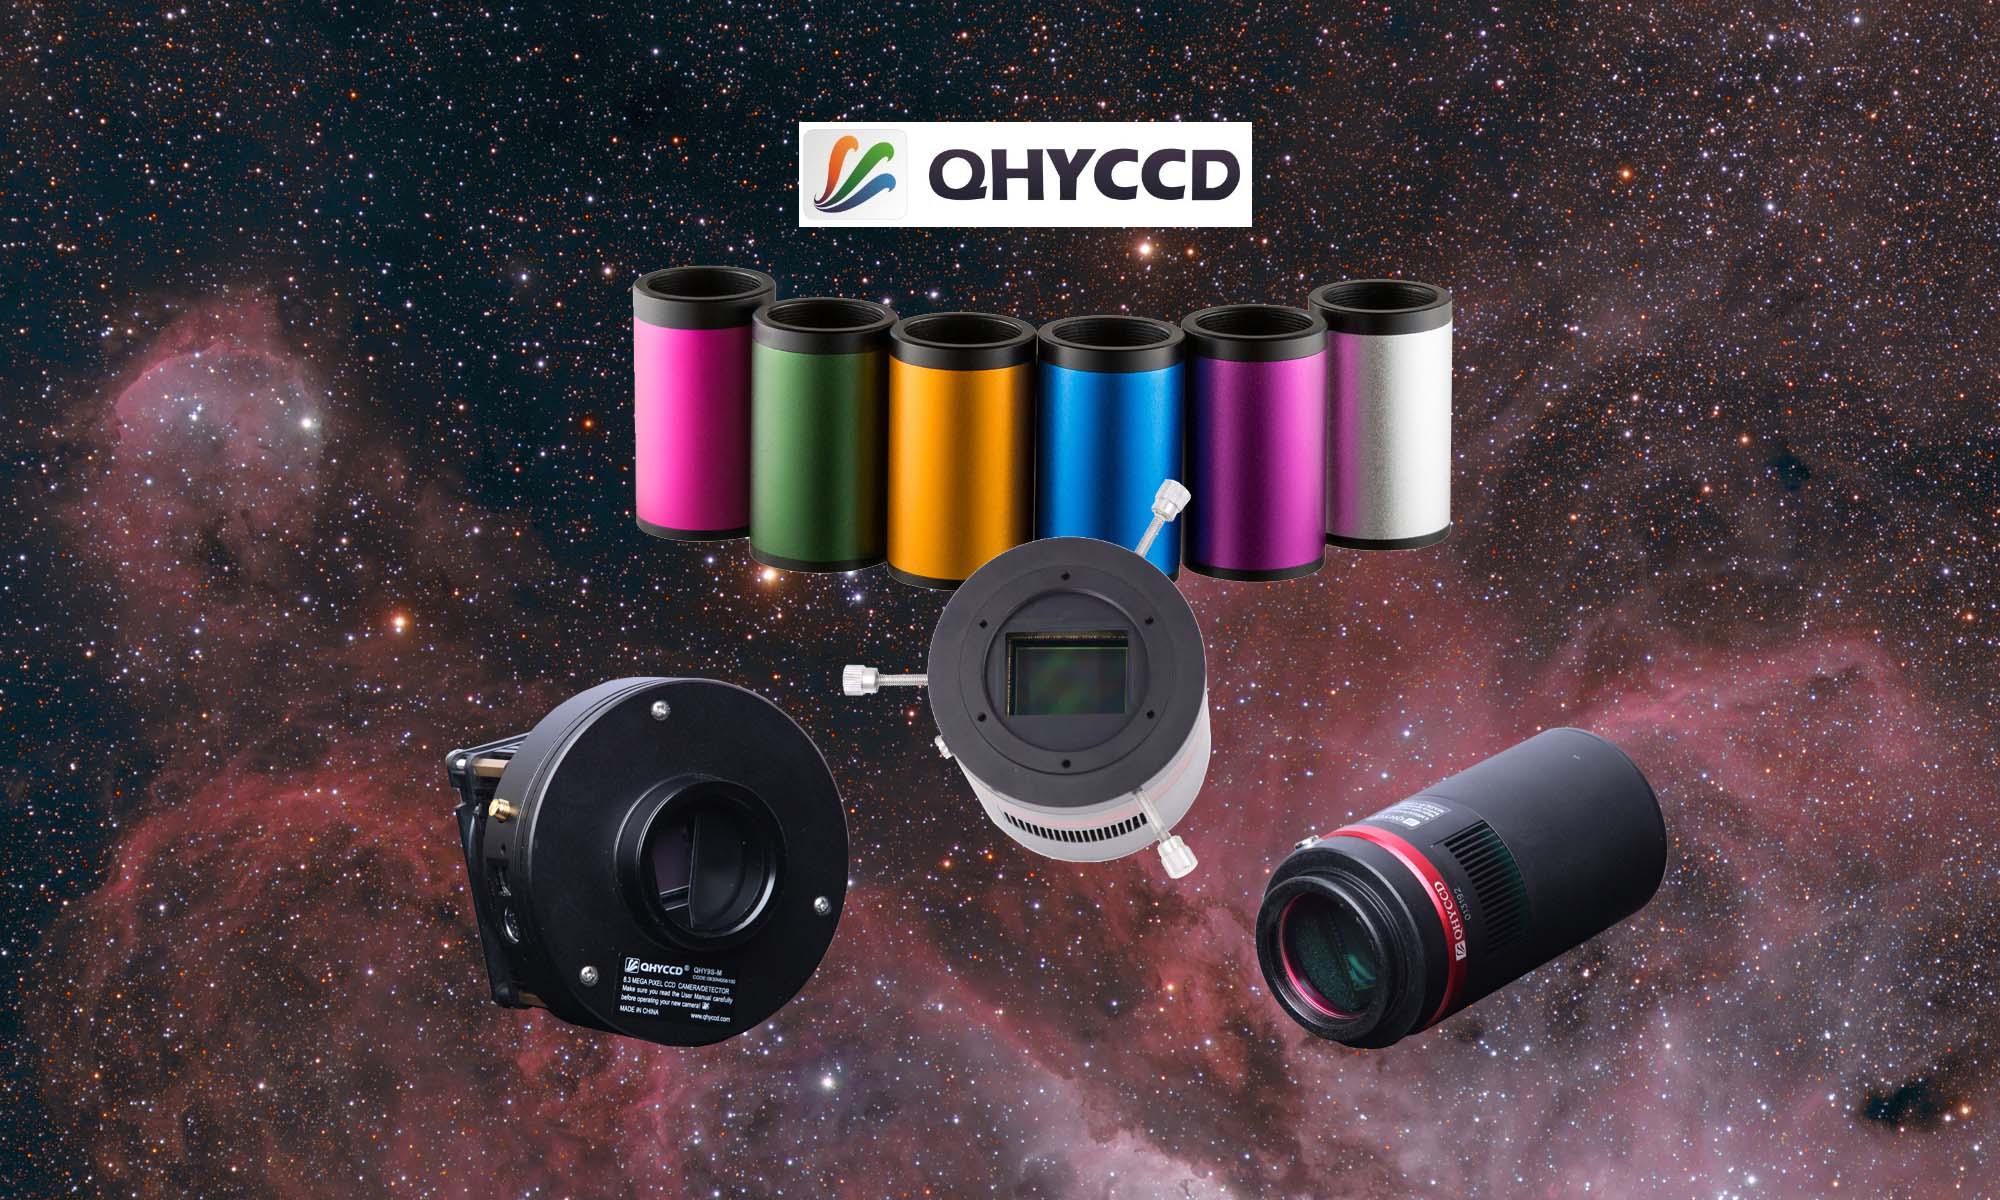 QHYCCD Cameras